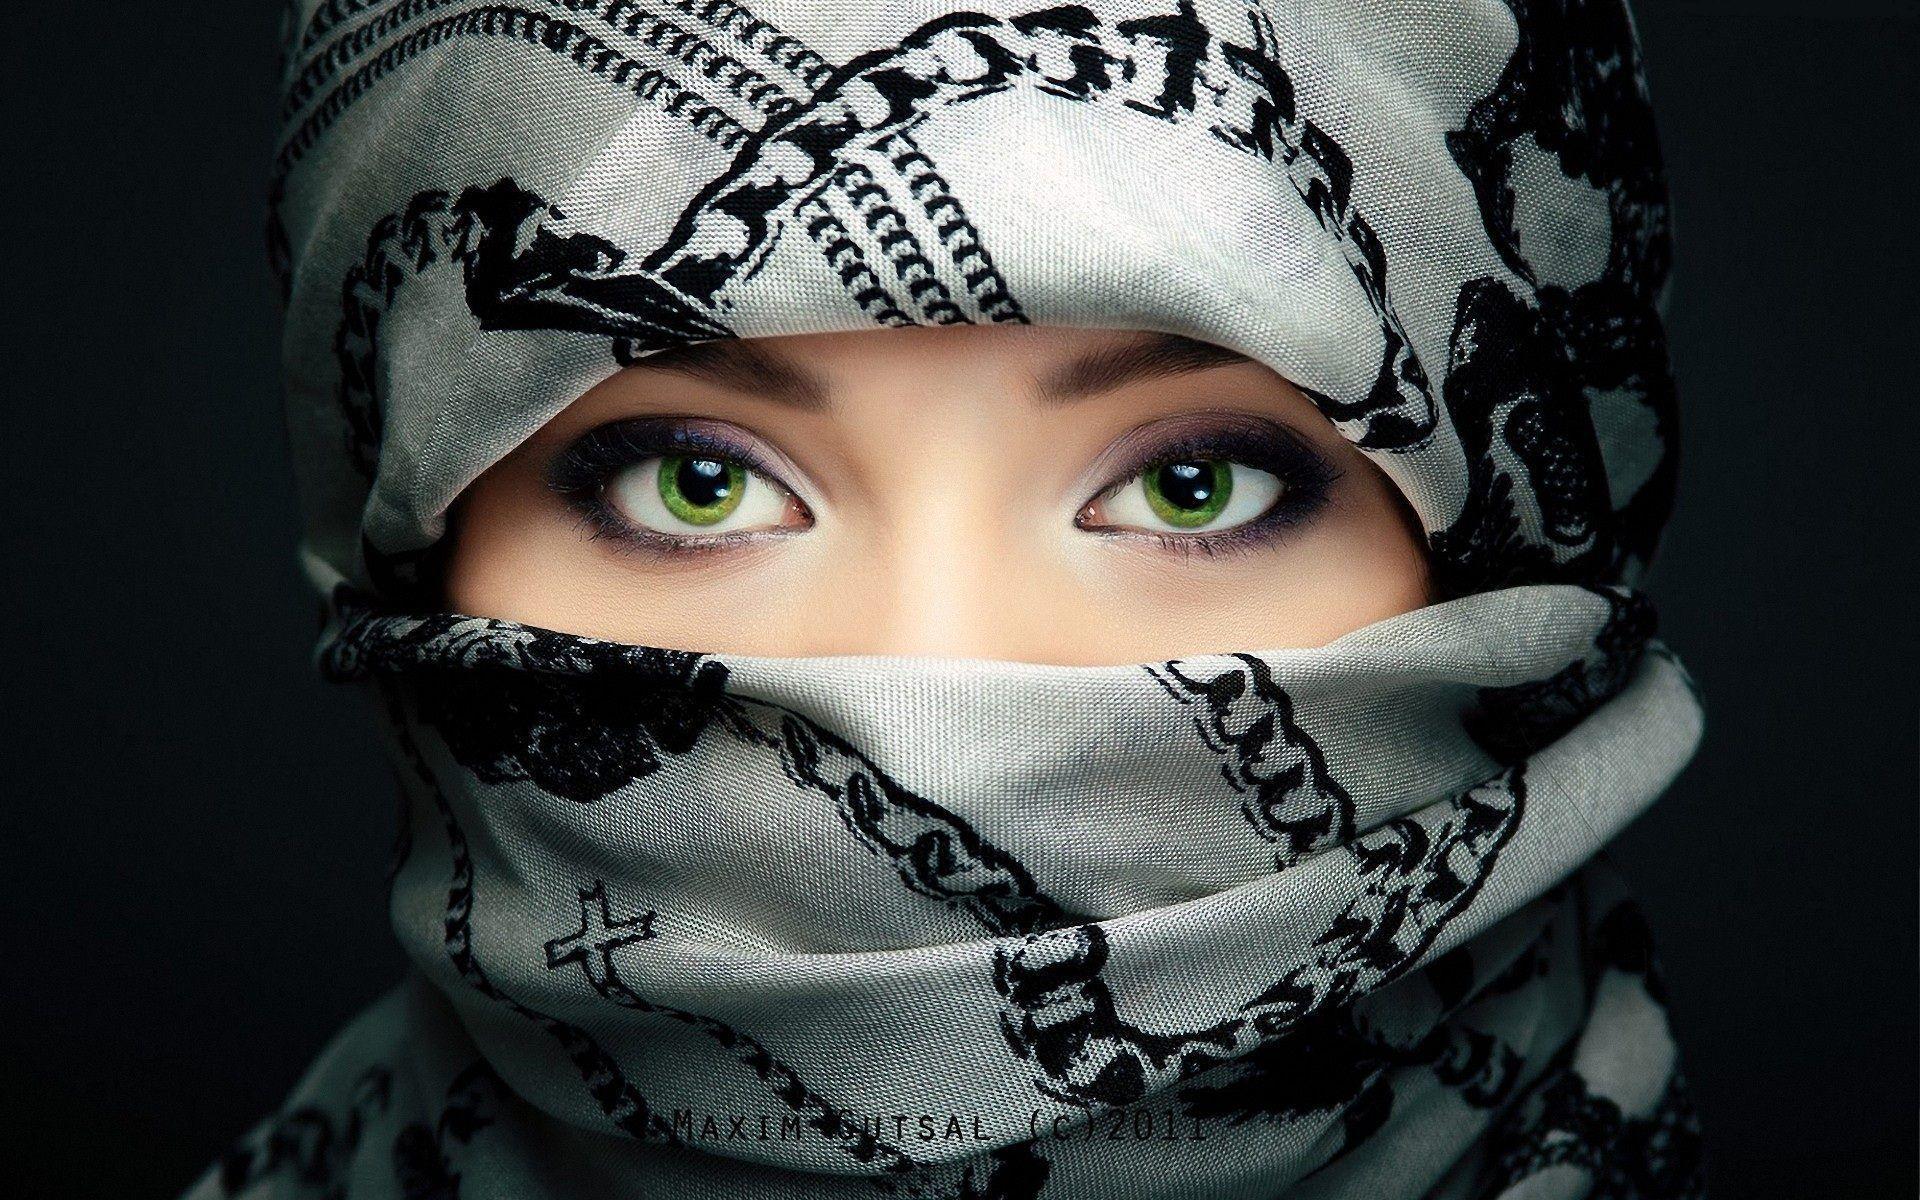 Photography Hijab Girl Eyes 4k Wallpapers Wallpaper Cave